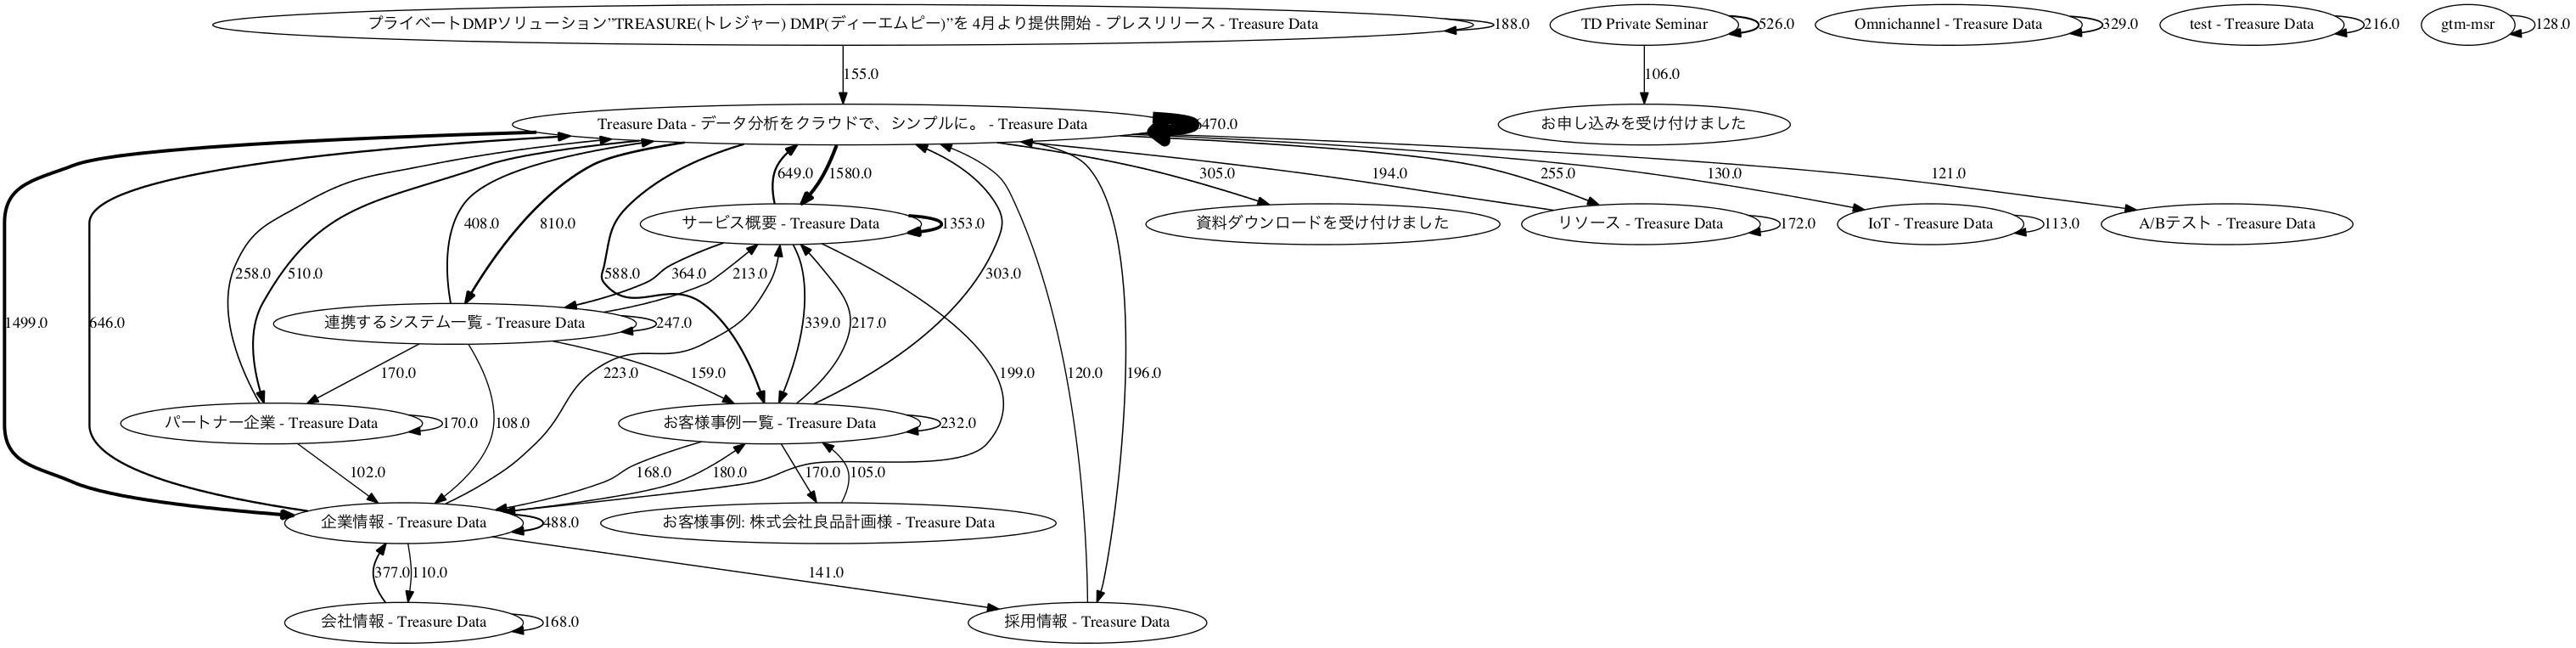 f:id:doryokujin:20160616155528p:plain